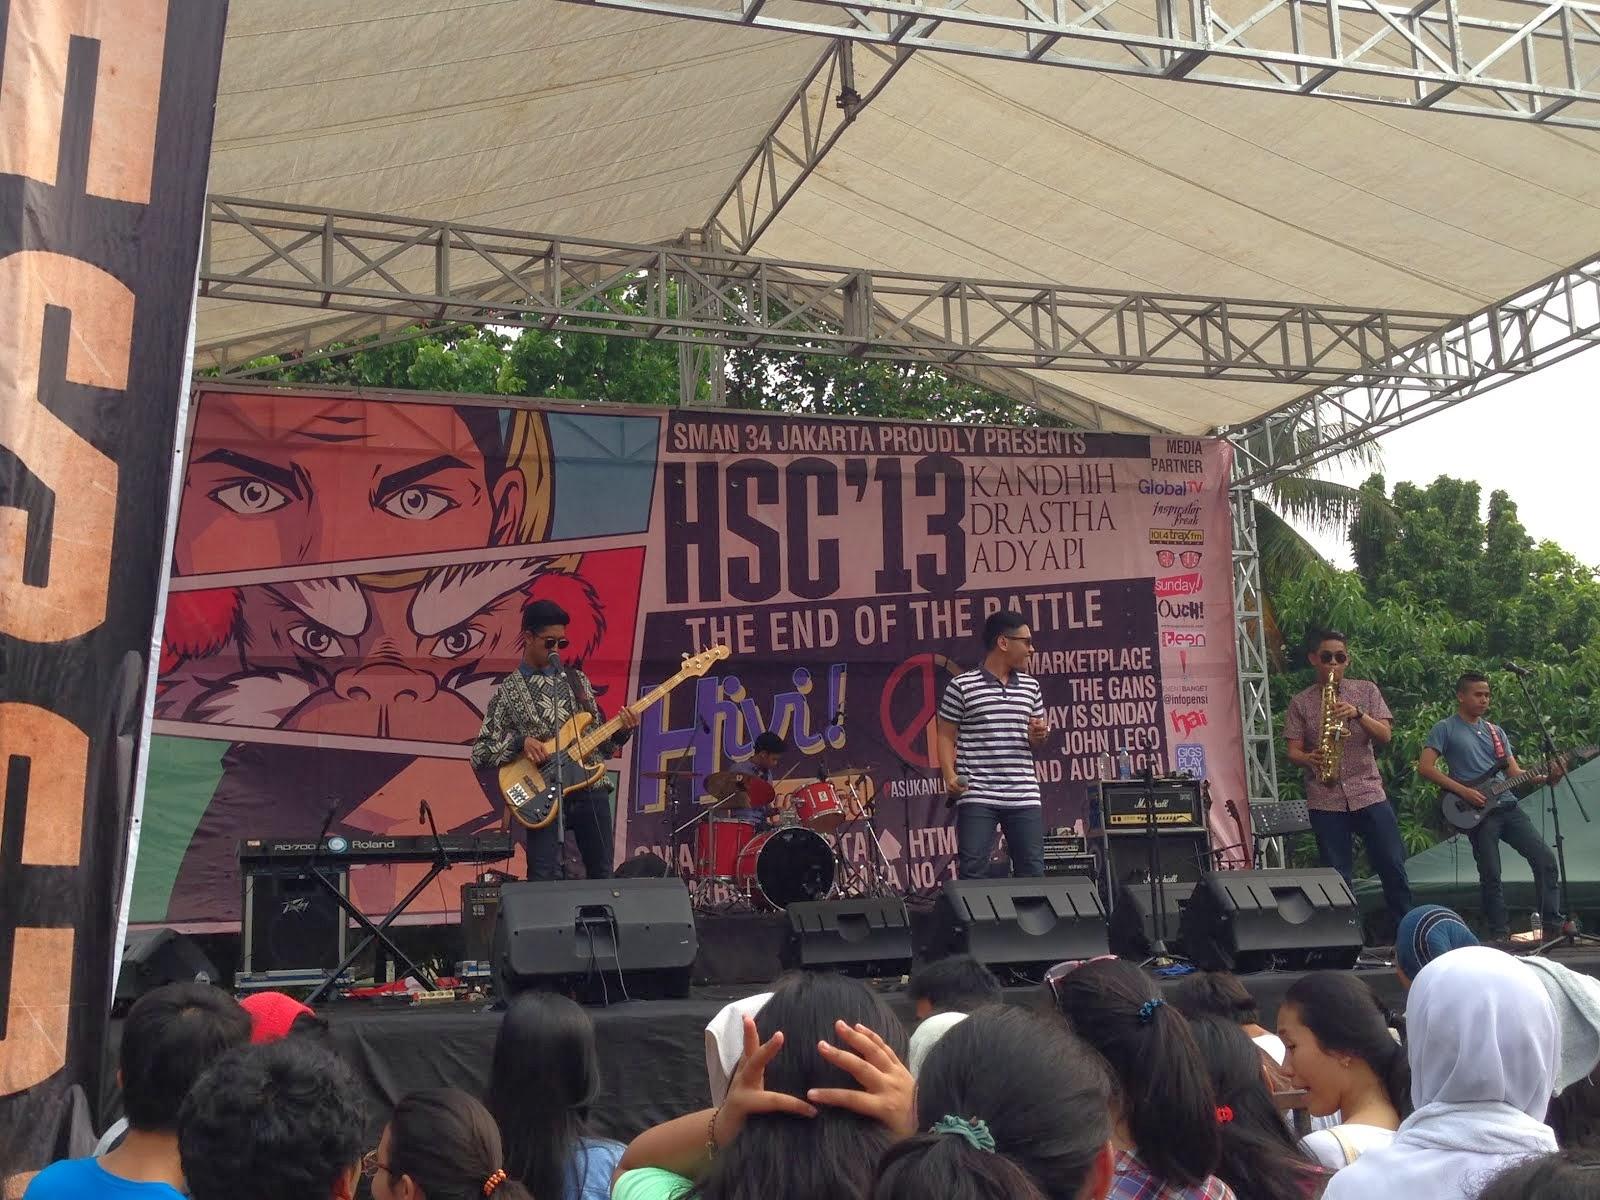 HSC '13, SMA 34 Jakarta